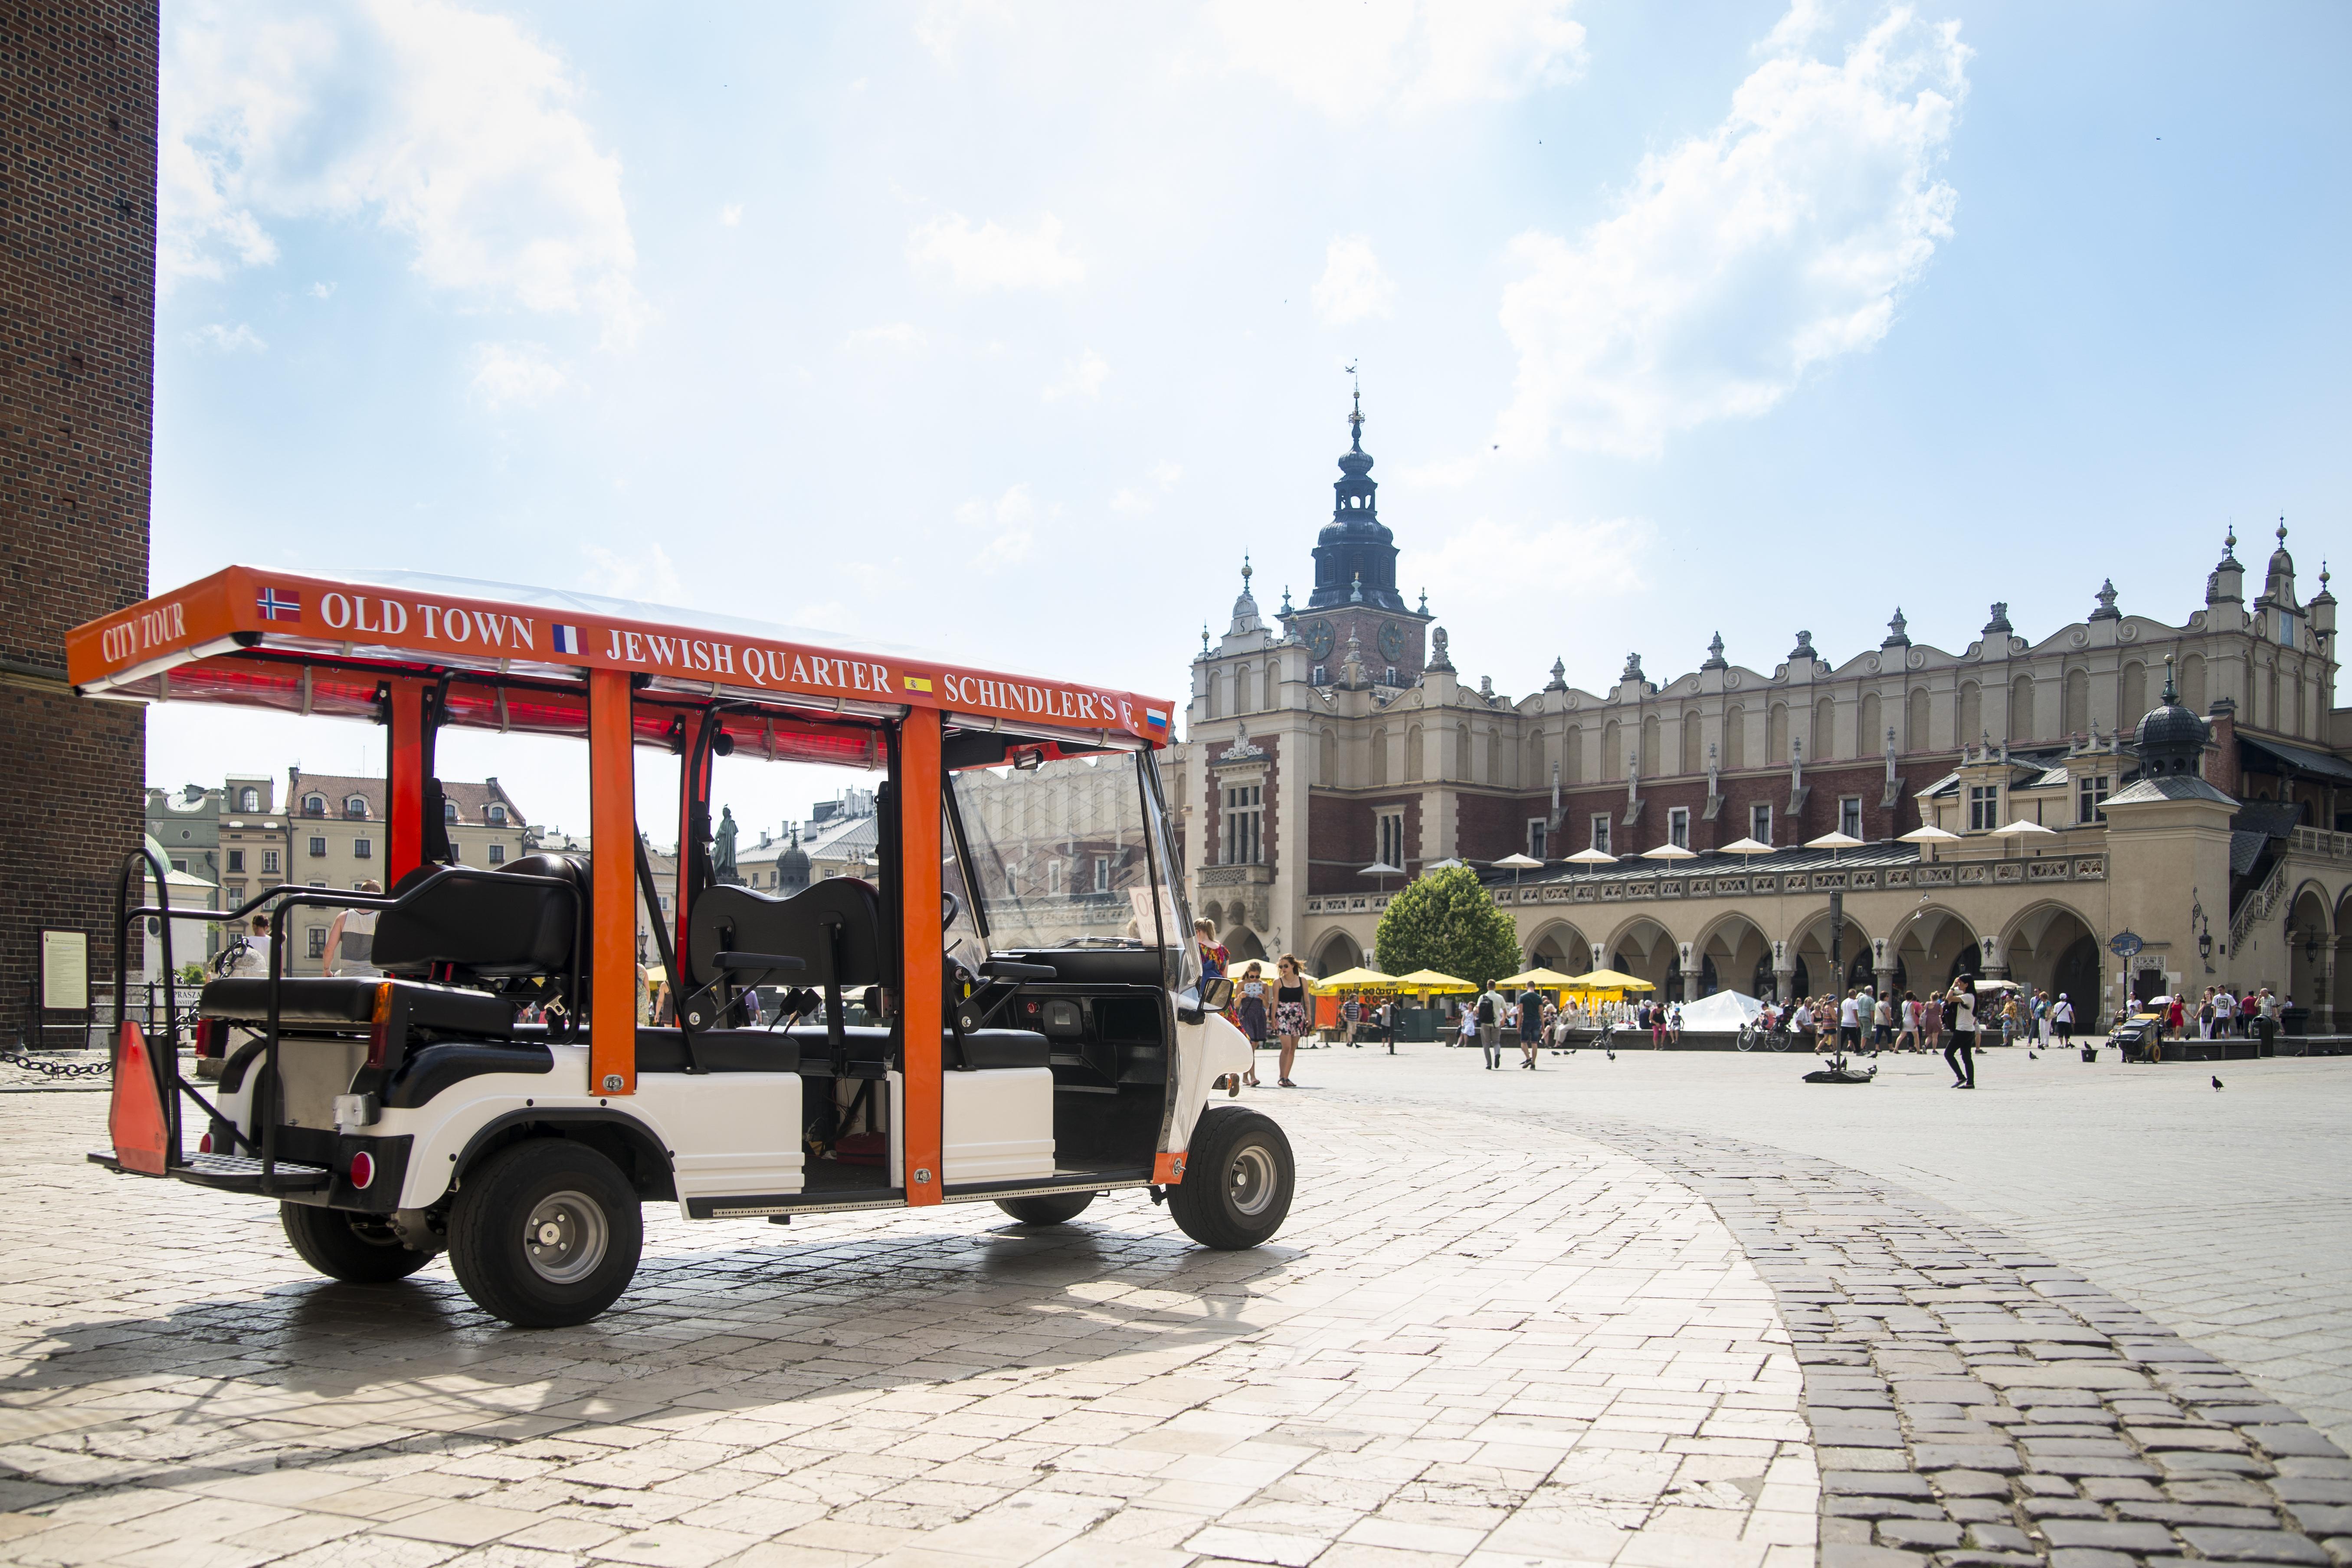 Krakow sightseeing by eco-vehicle (Melex) - 3 zones SINGLE Ticket